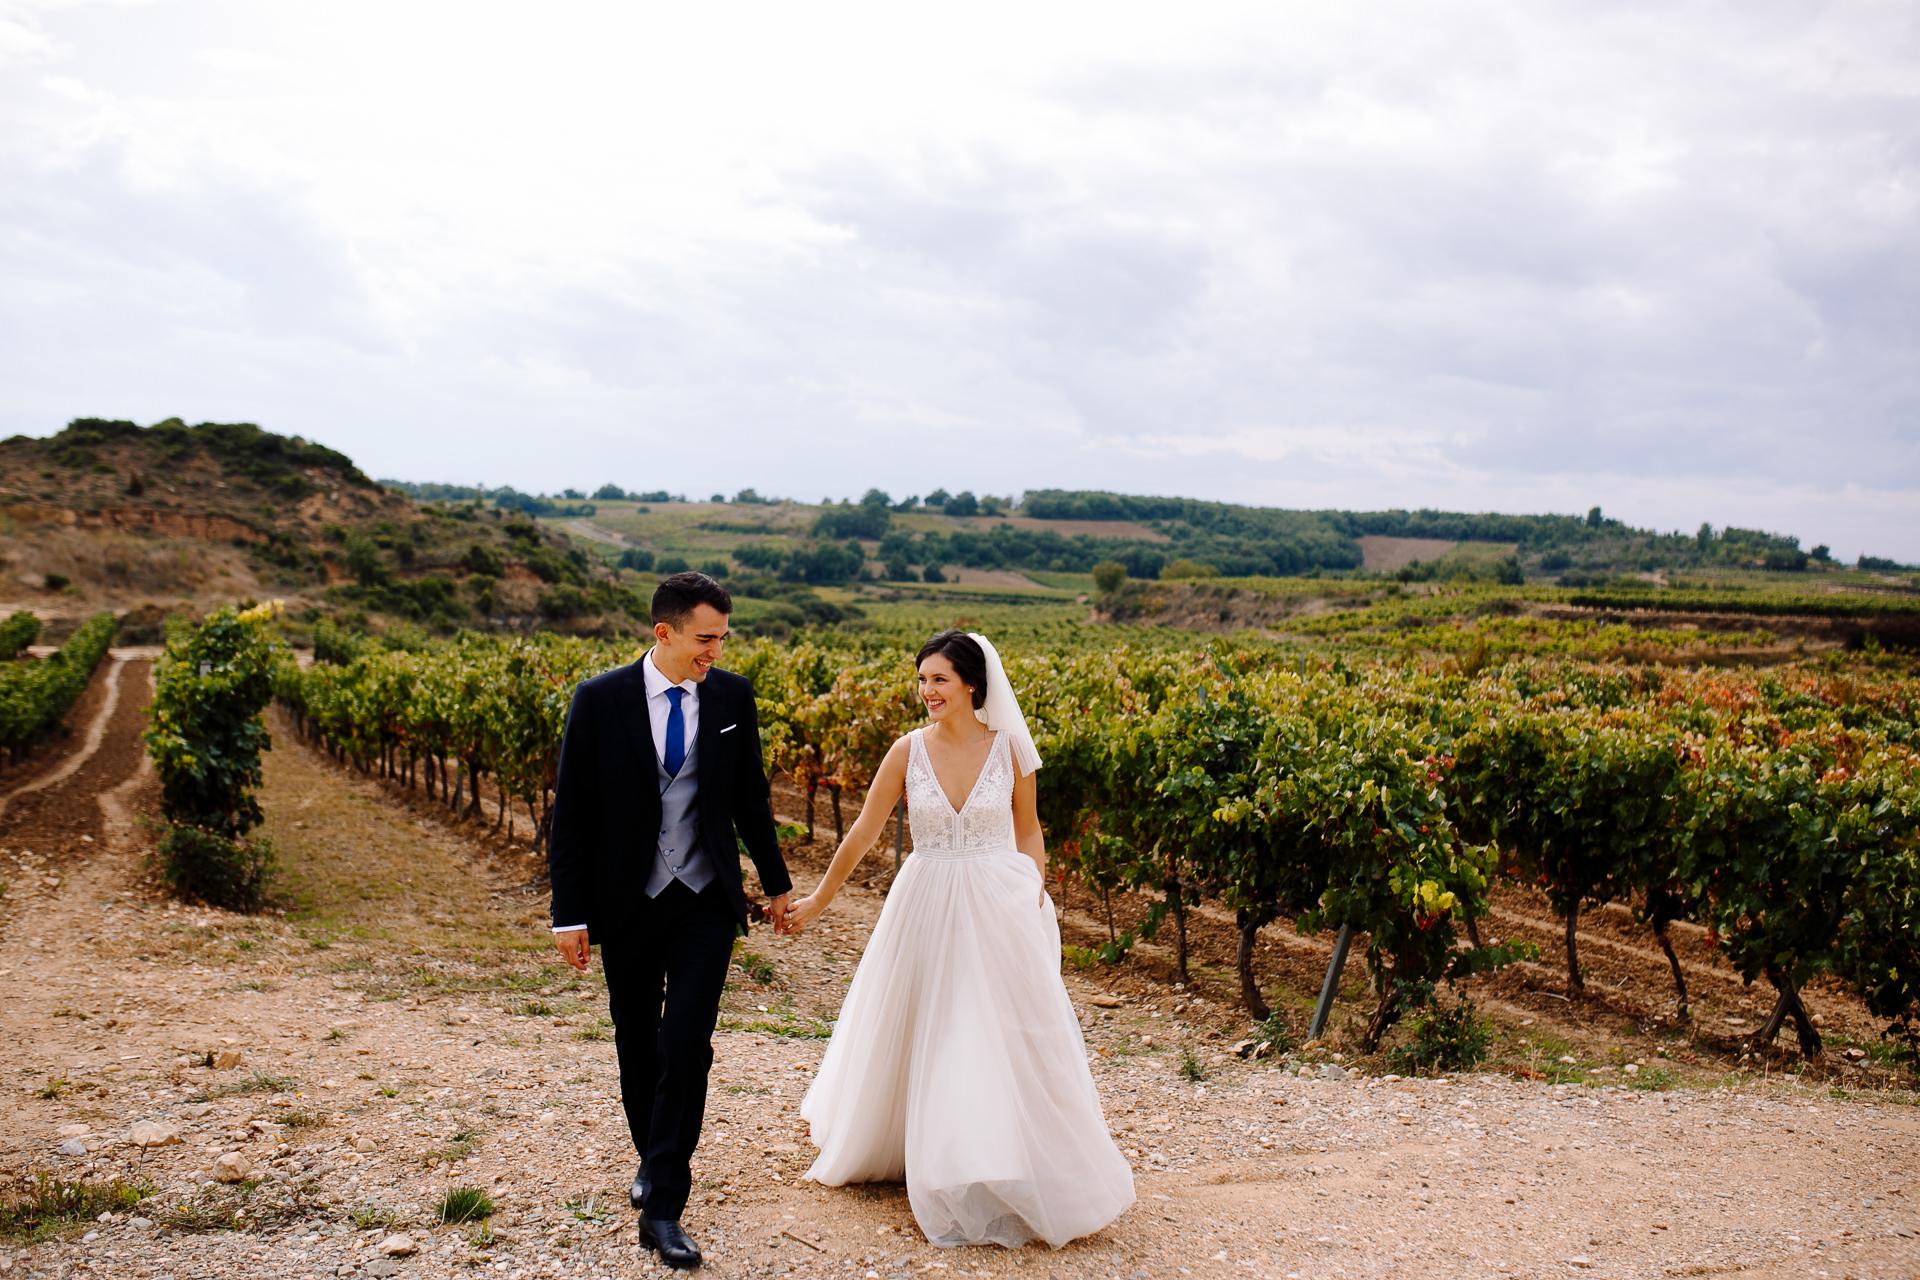 boda civil eguren ugarte larioja 150634